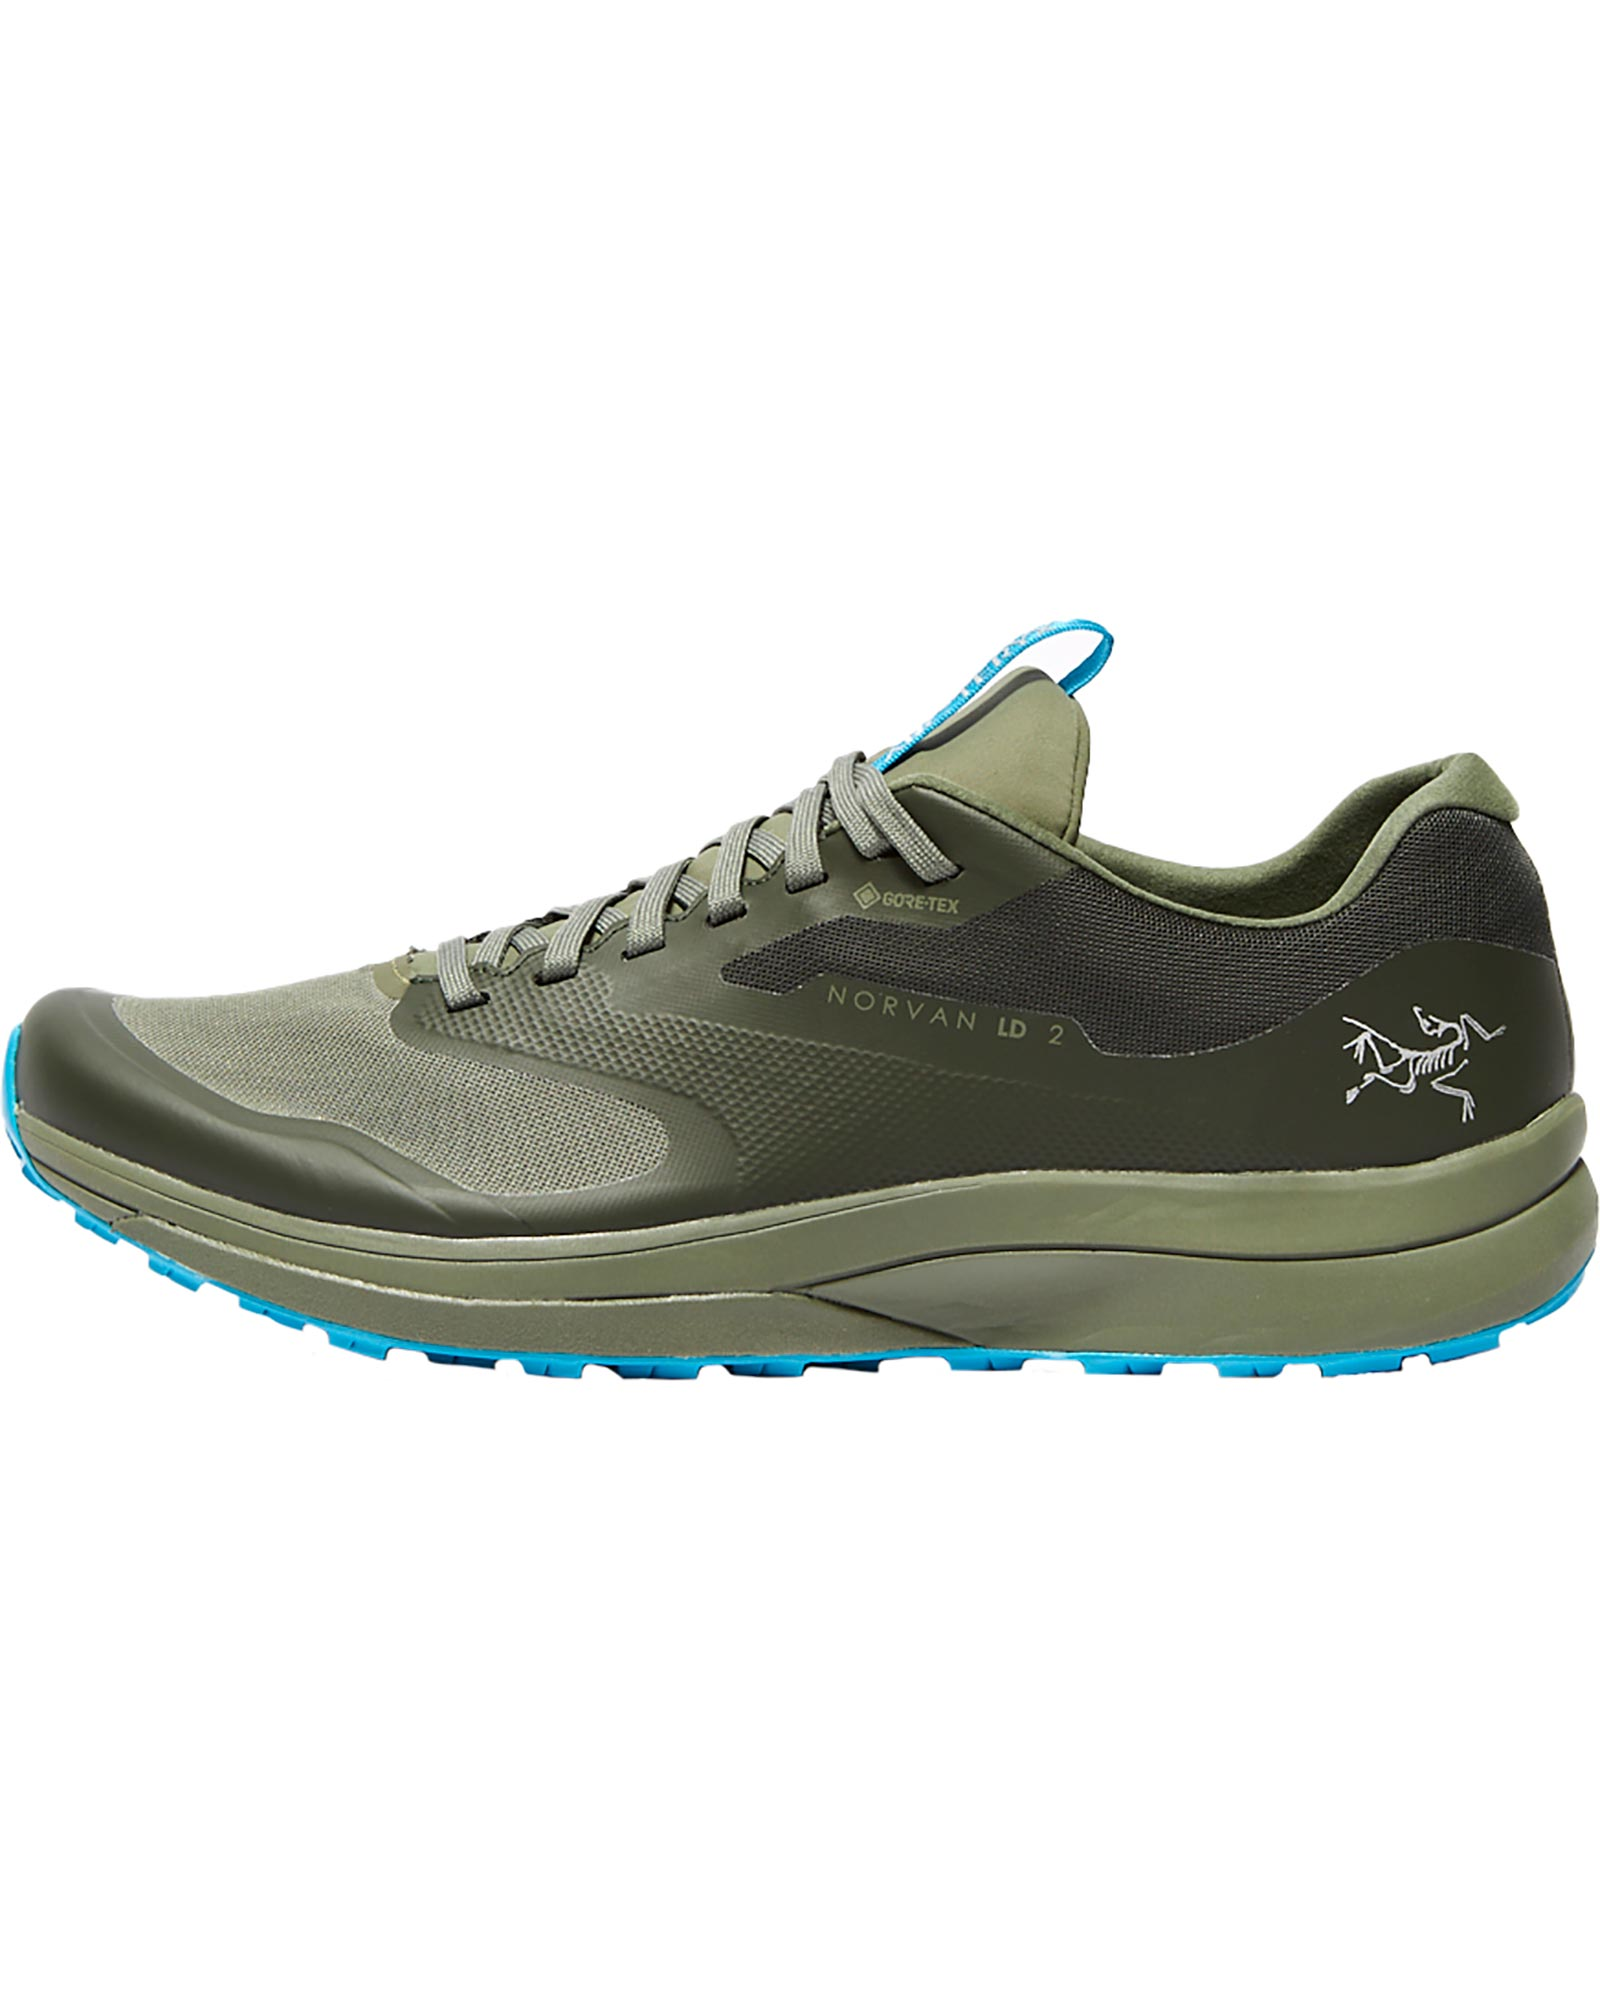 Arc'teryx Men's Norvan LD 2 GORE-TEX Trail Running Shoes 0